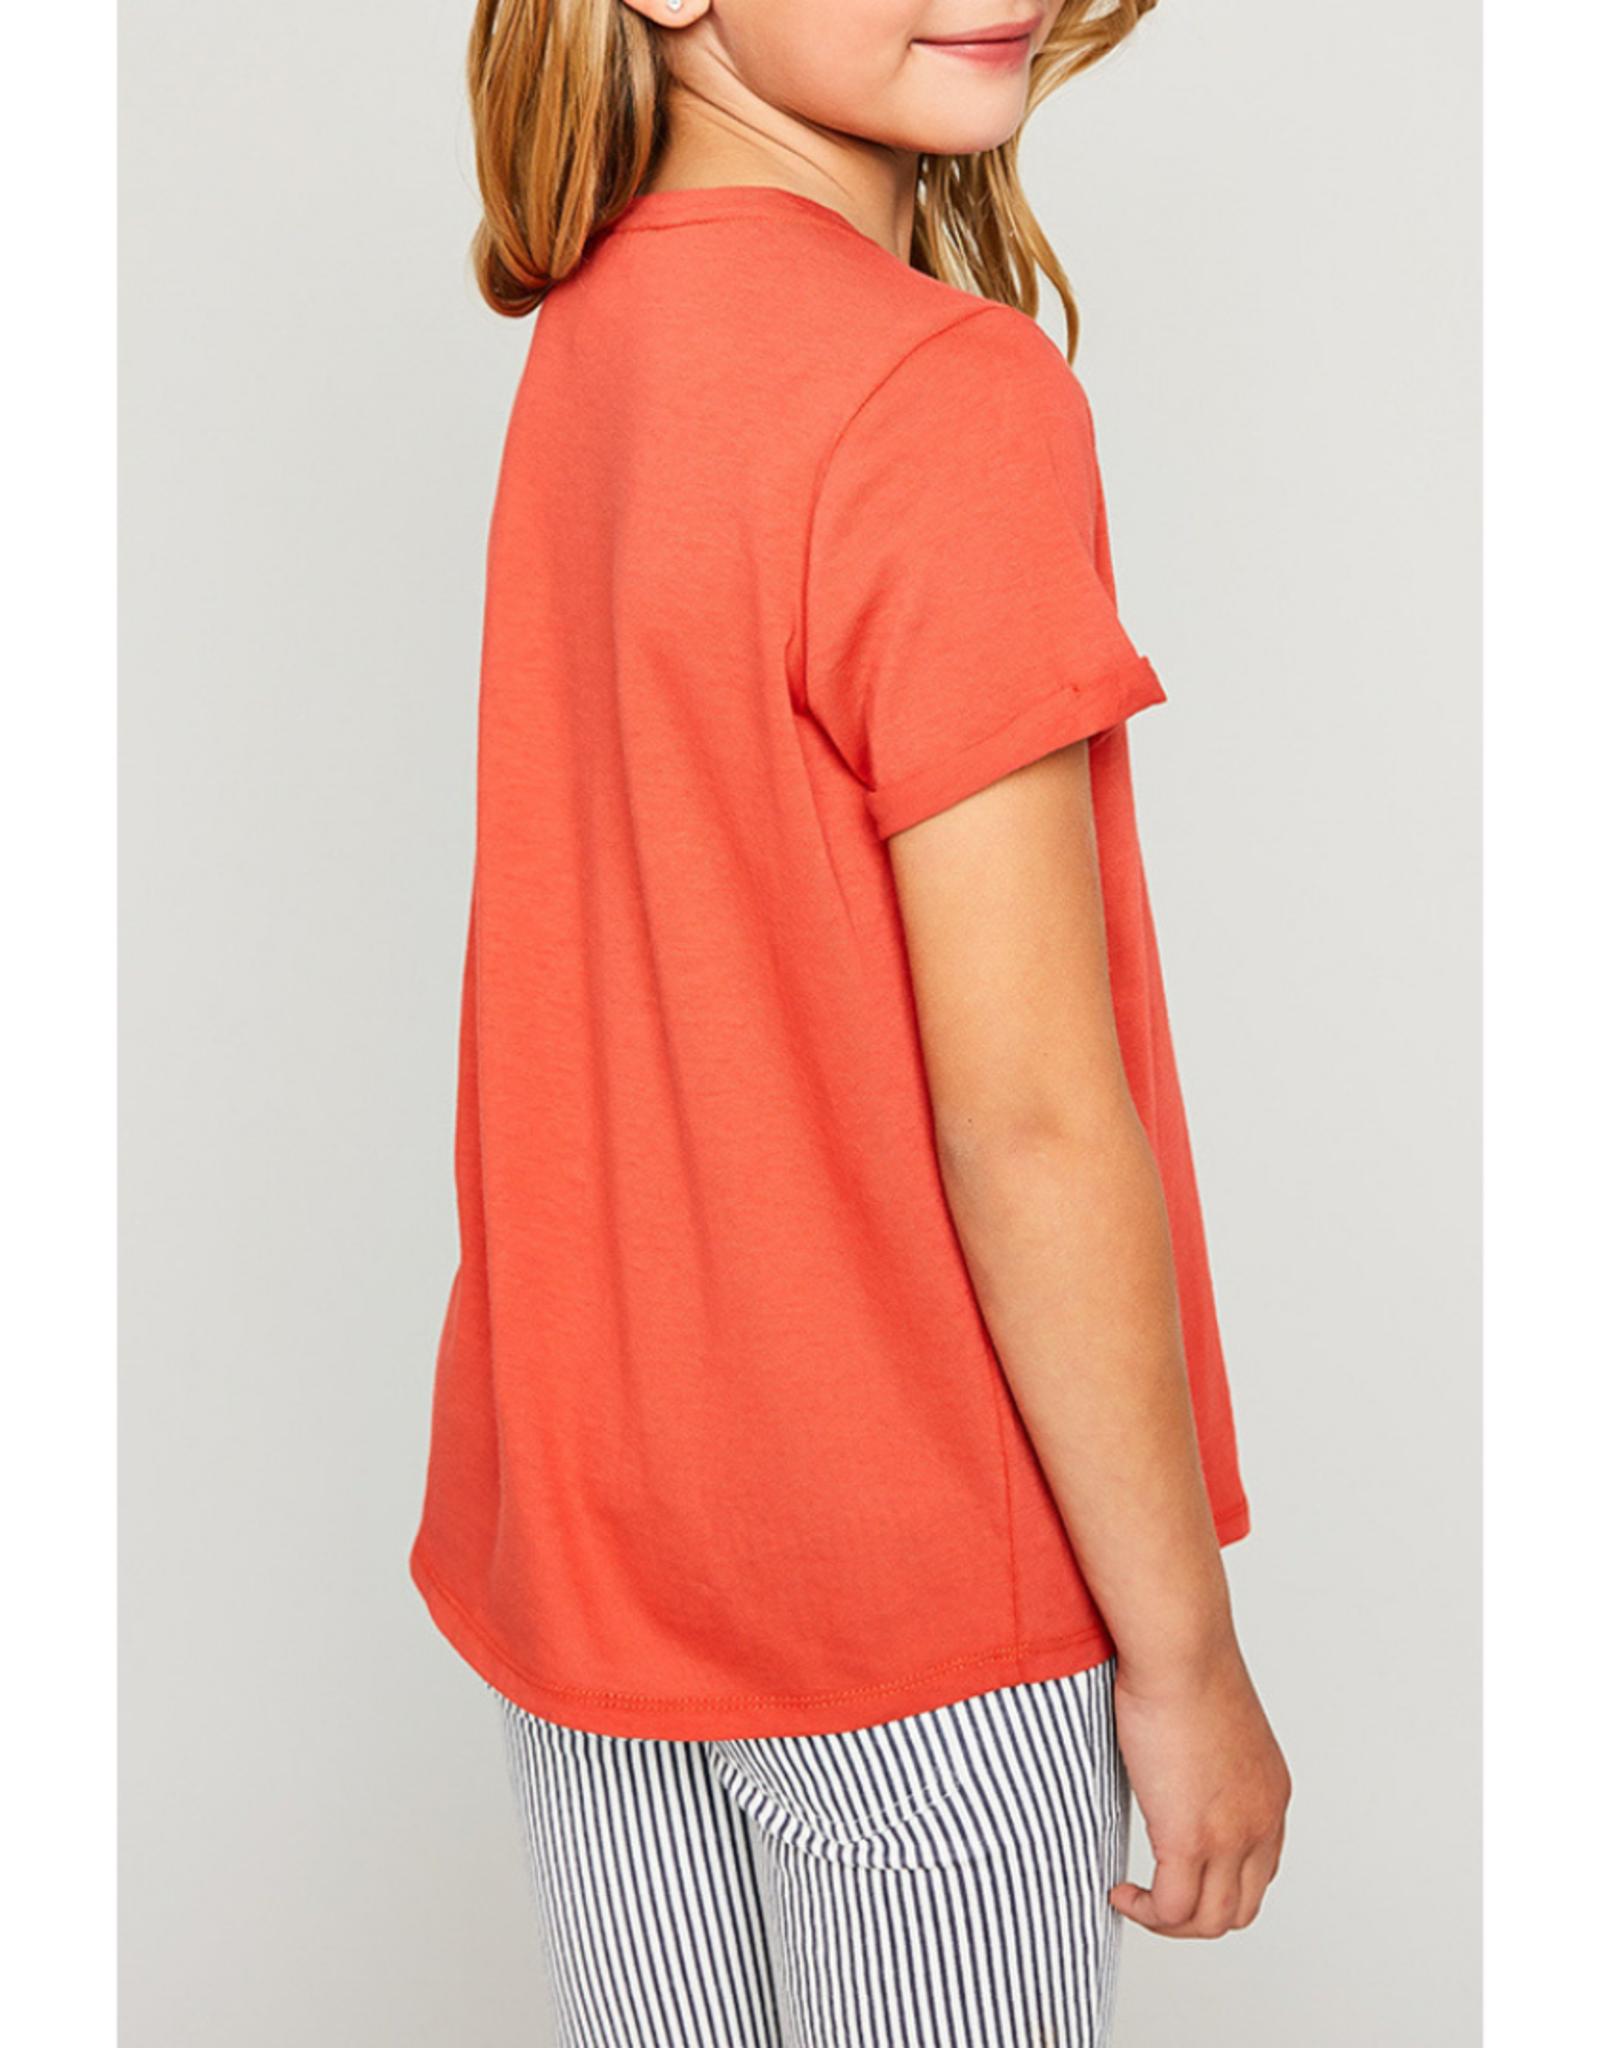 Hayden Girls Hayden Girls Criss Cross T-Shirt - Tomato